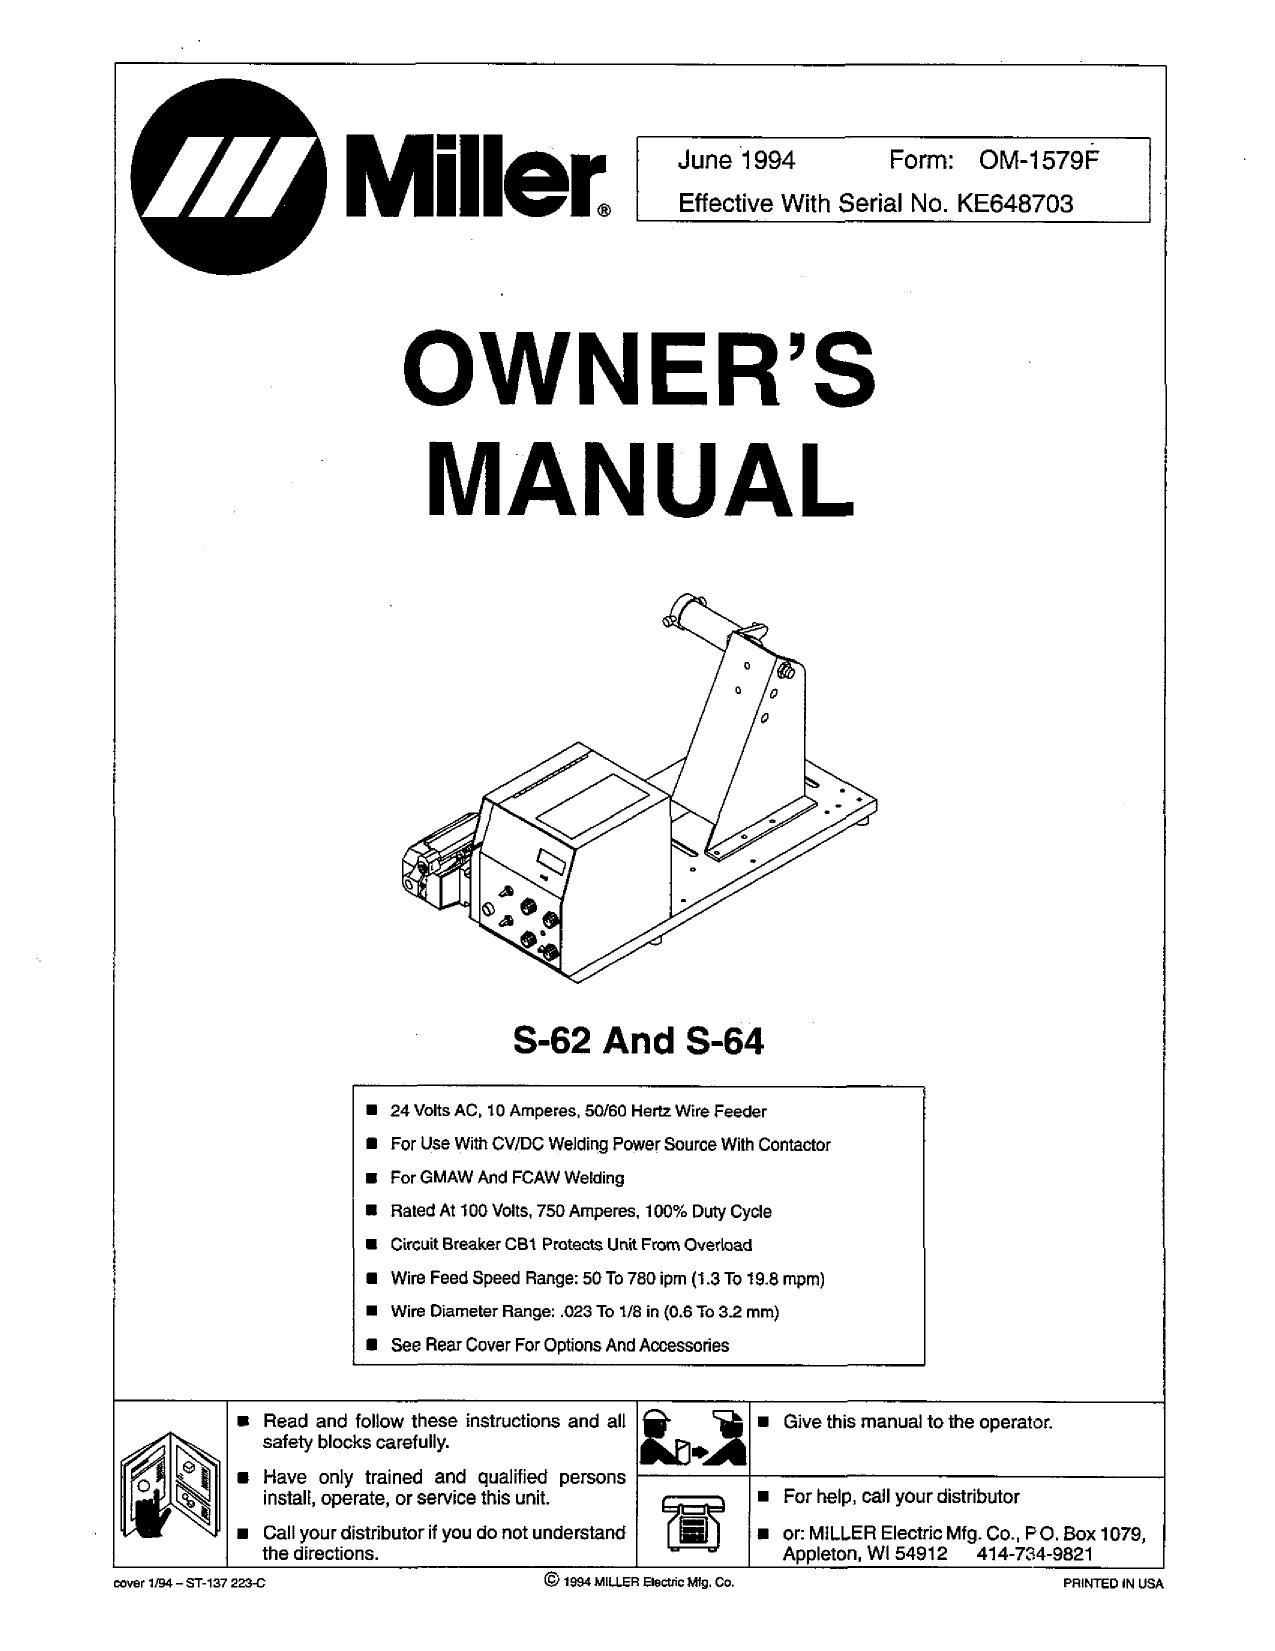 2 Cylinder Deere Wiring Miller S 62 Wire Feeder User Manual Of 2 Cylinder Deere Wiring